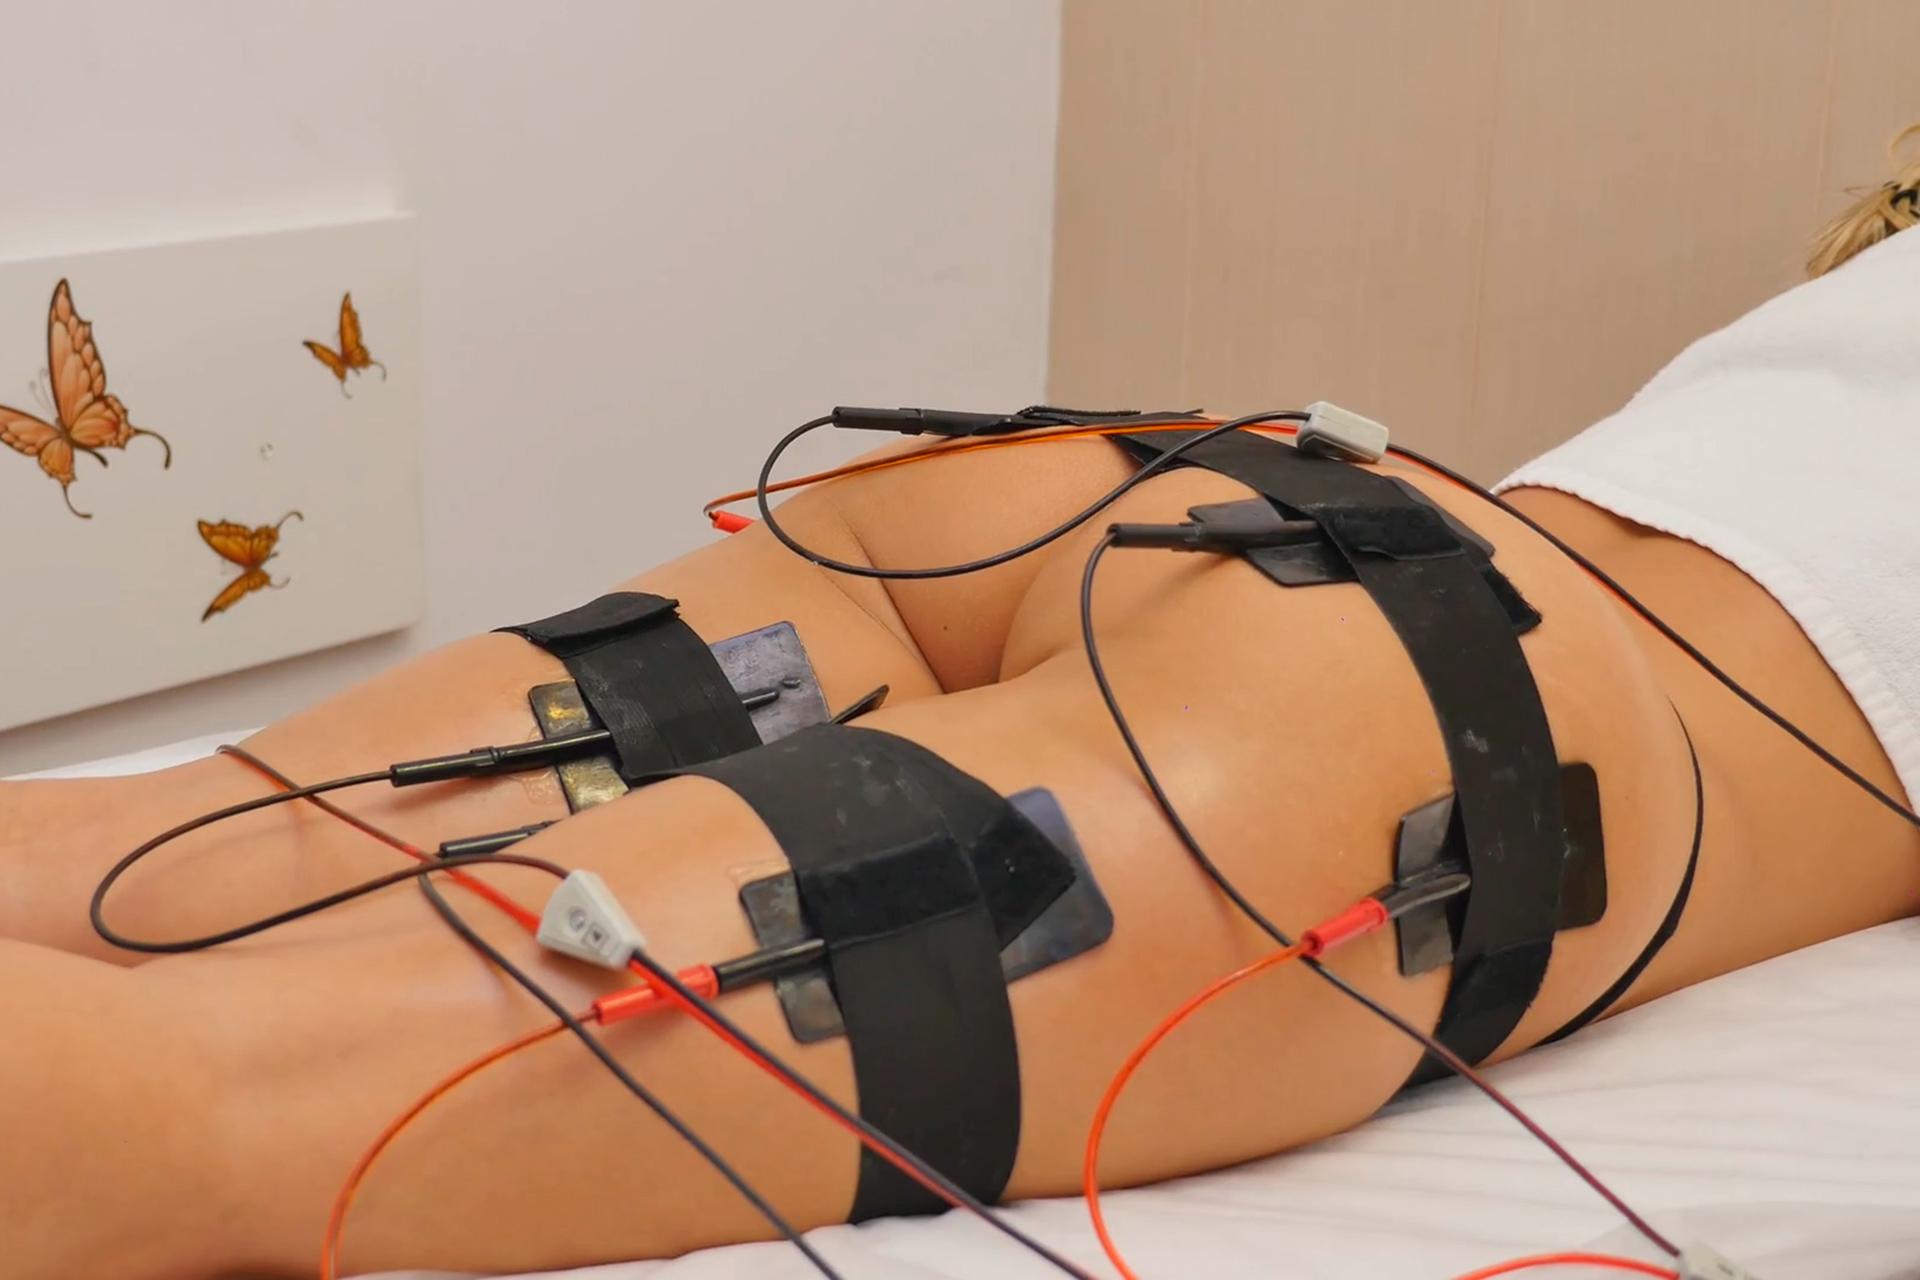 Omnia elektrostimulacija ili ultrazvuk